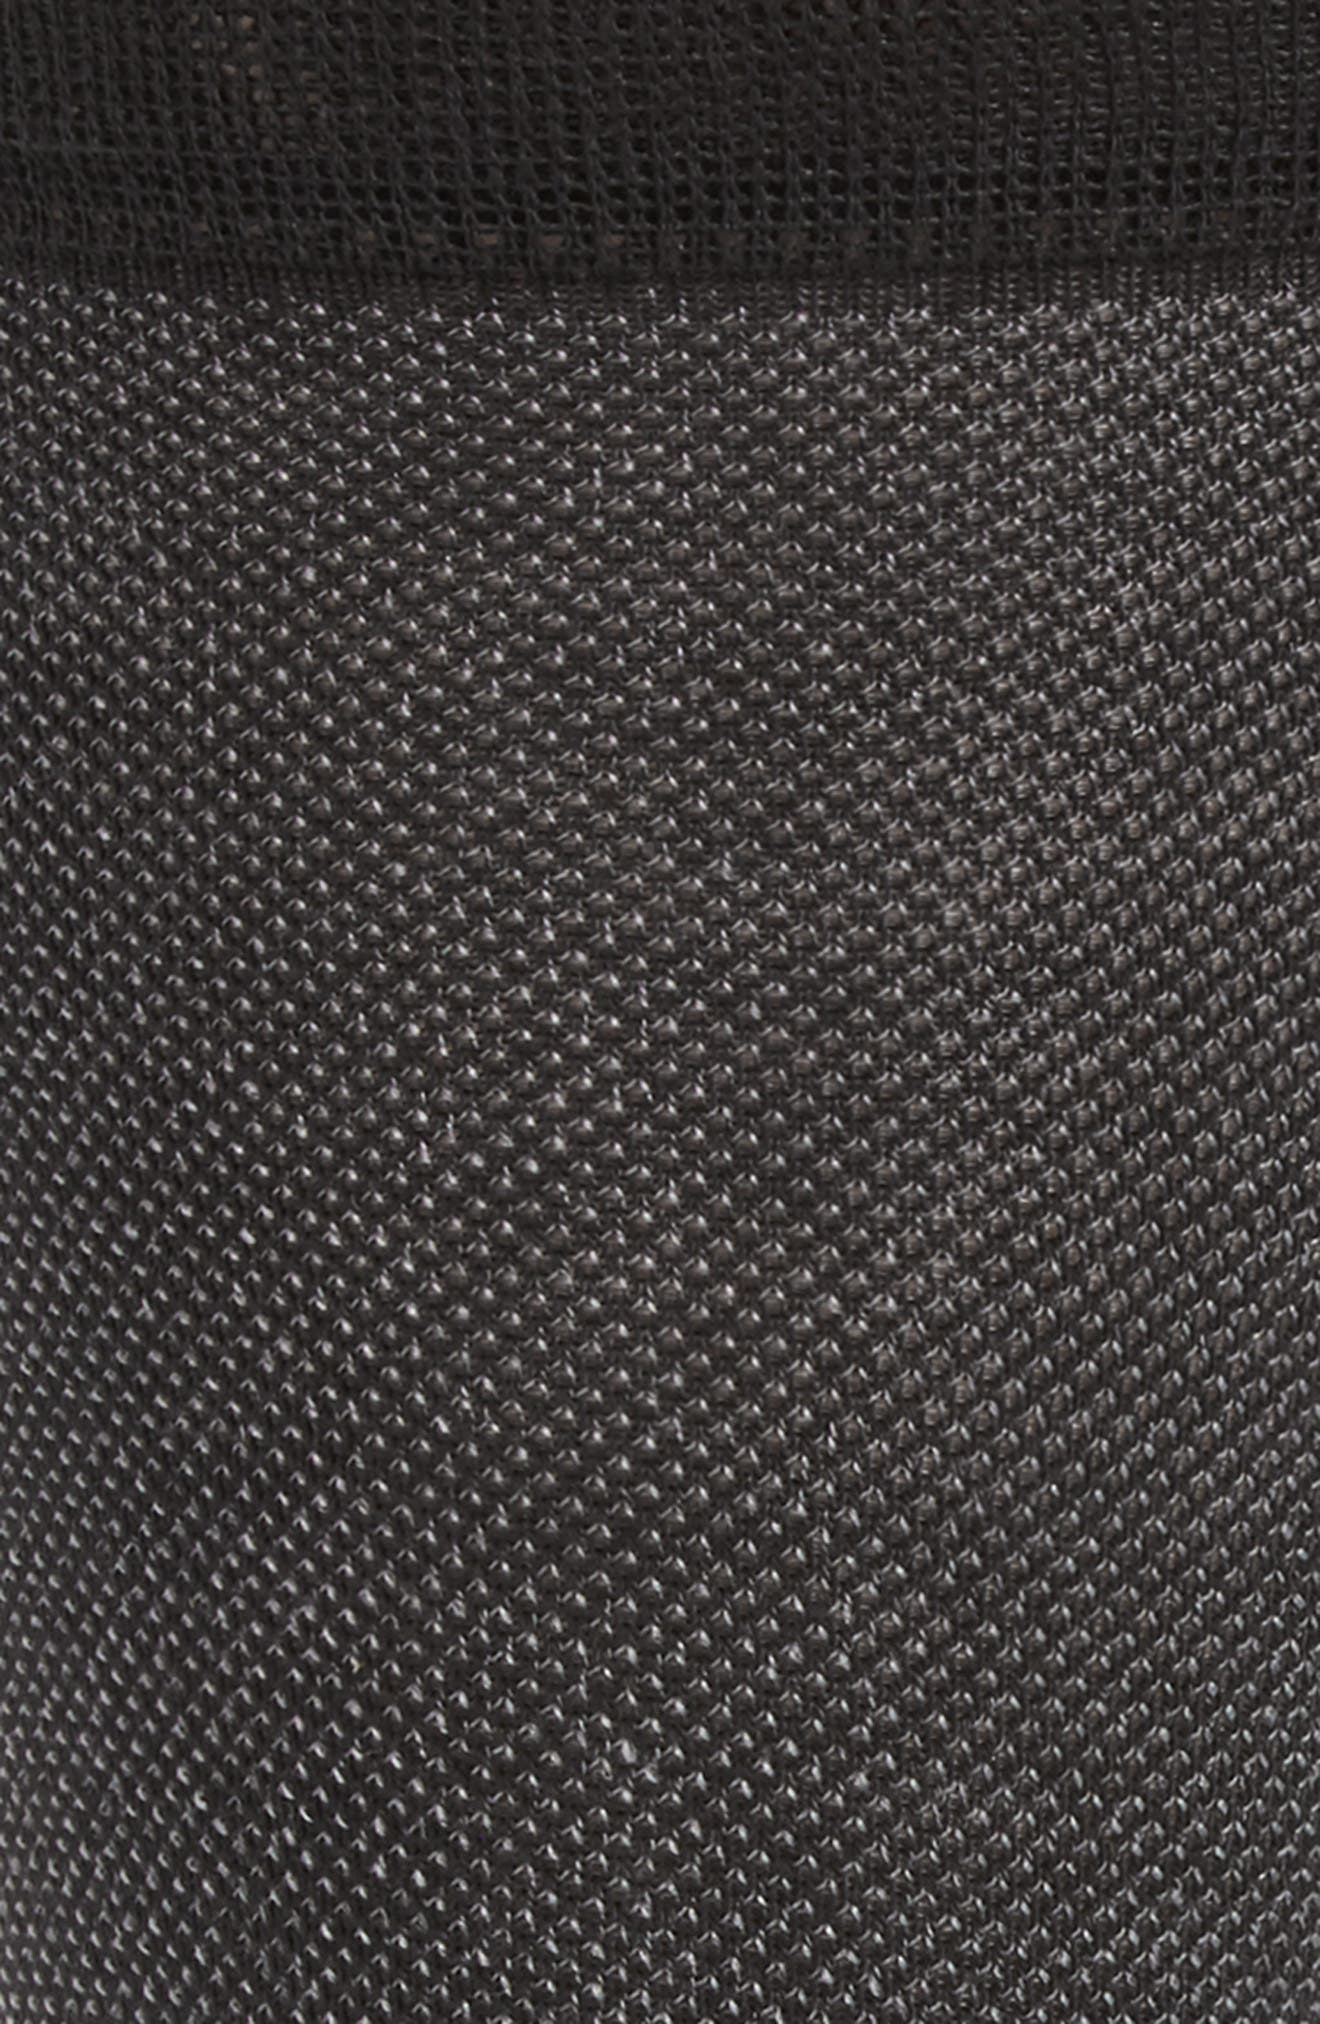 Piqué Texture Crew Socks,                             Alternate thumbnail 3, color,                             BLACK